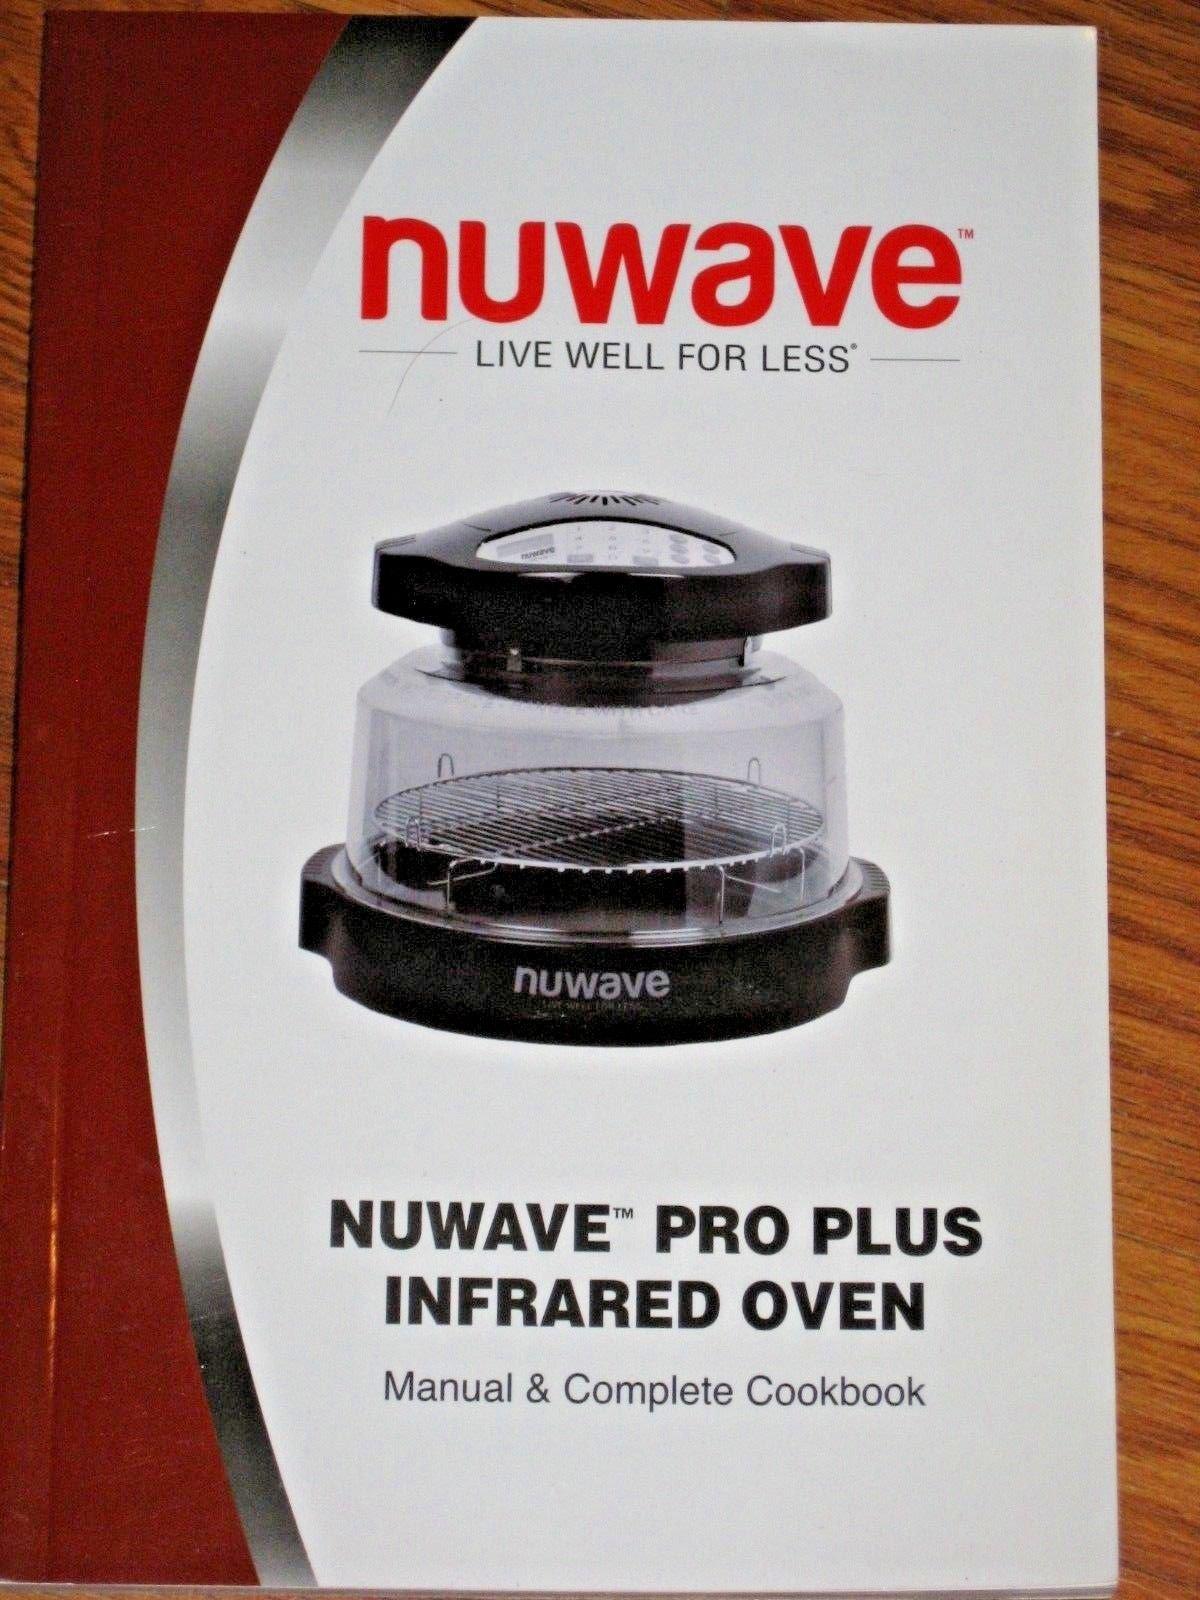 Pro Plus Nuwave Infrared Oven Manual & Complete Cookbook: staff:  Amazon.com: Books